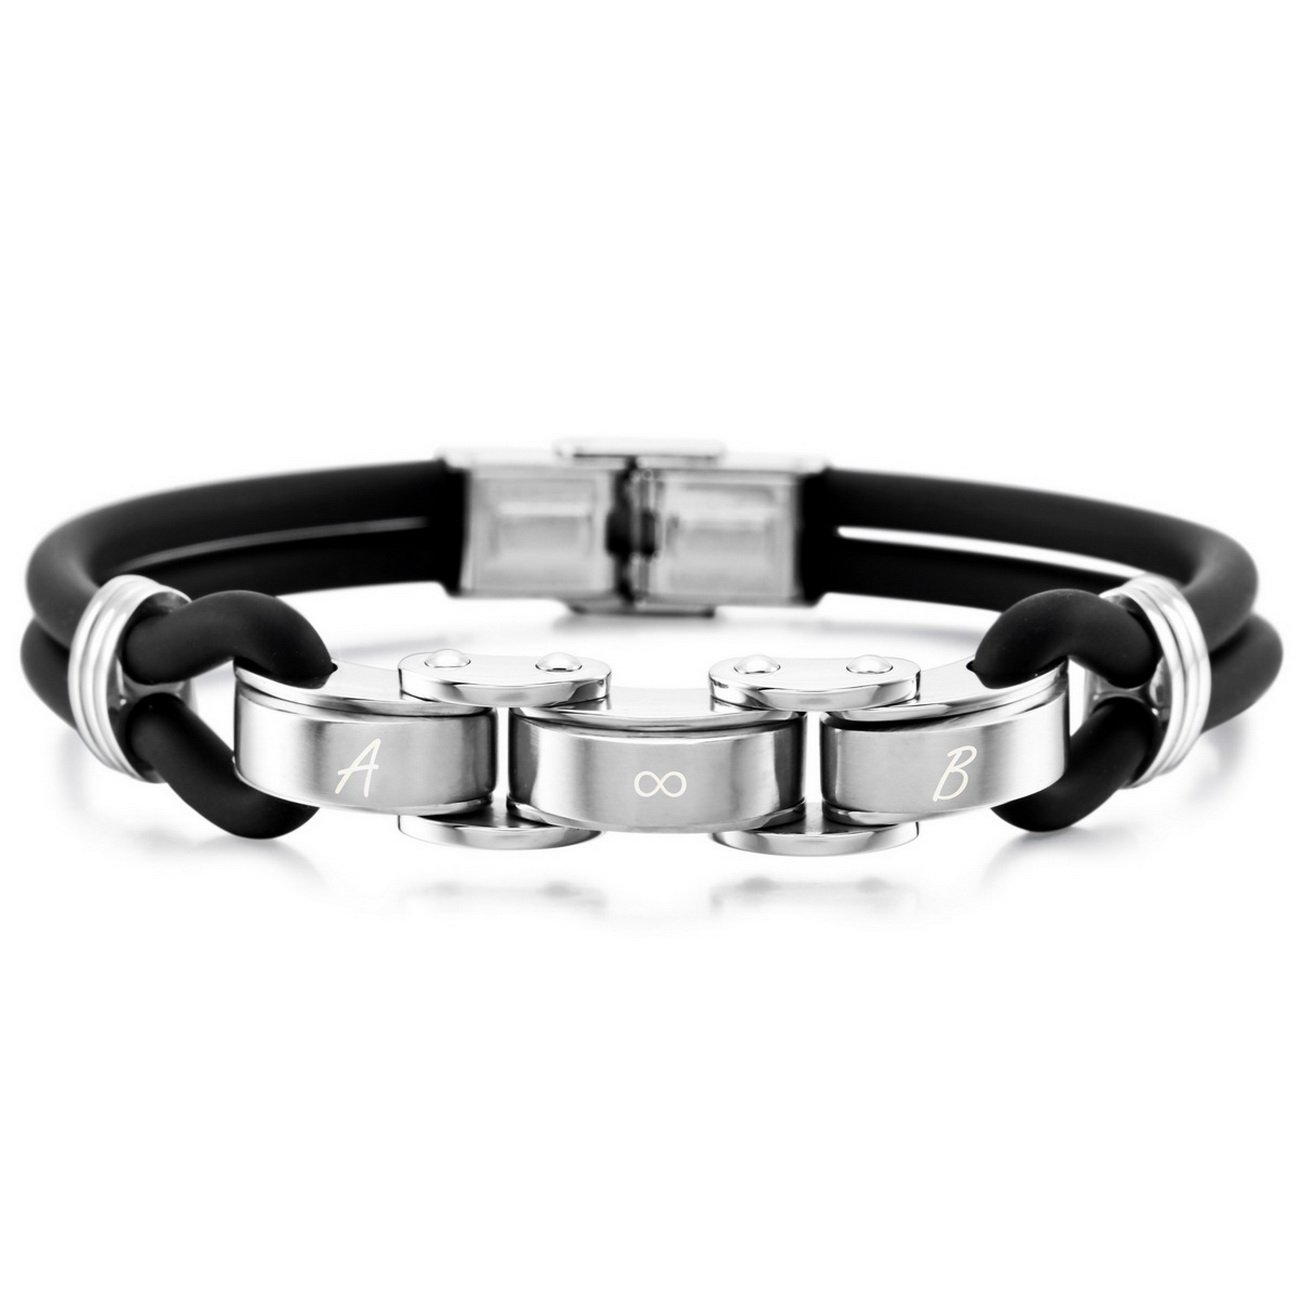 Customized Engraving MeMeDIY Black Stainless Steel Rubber Bracelet Bangle Cuff